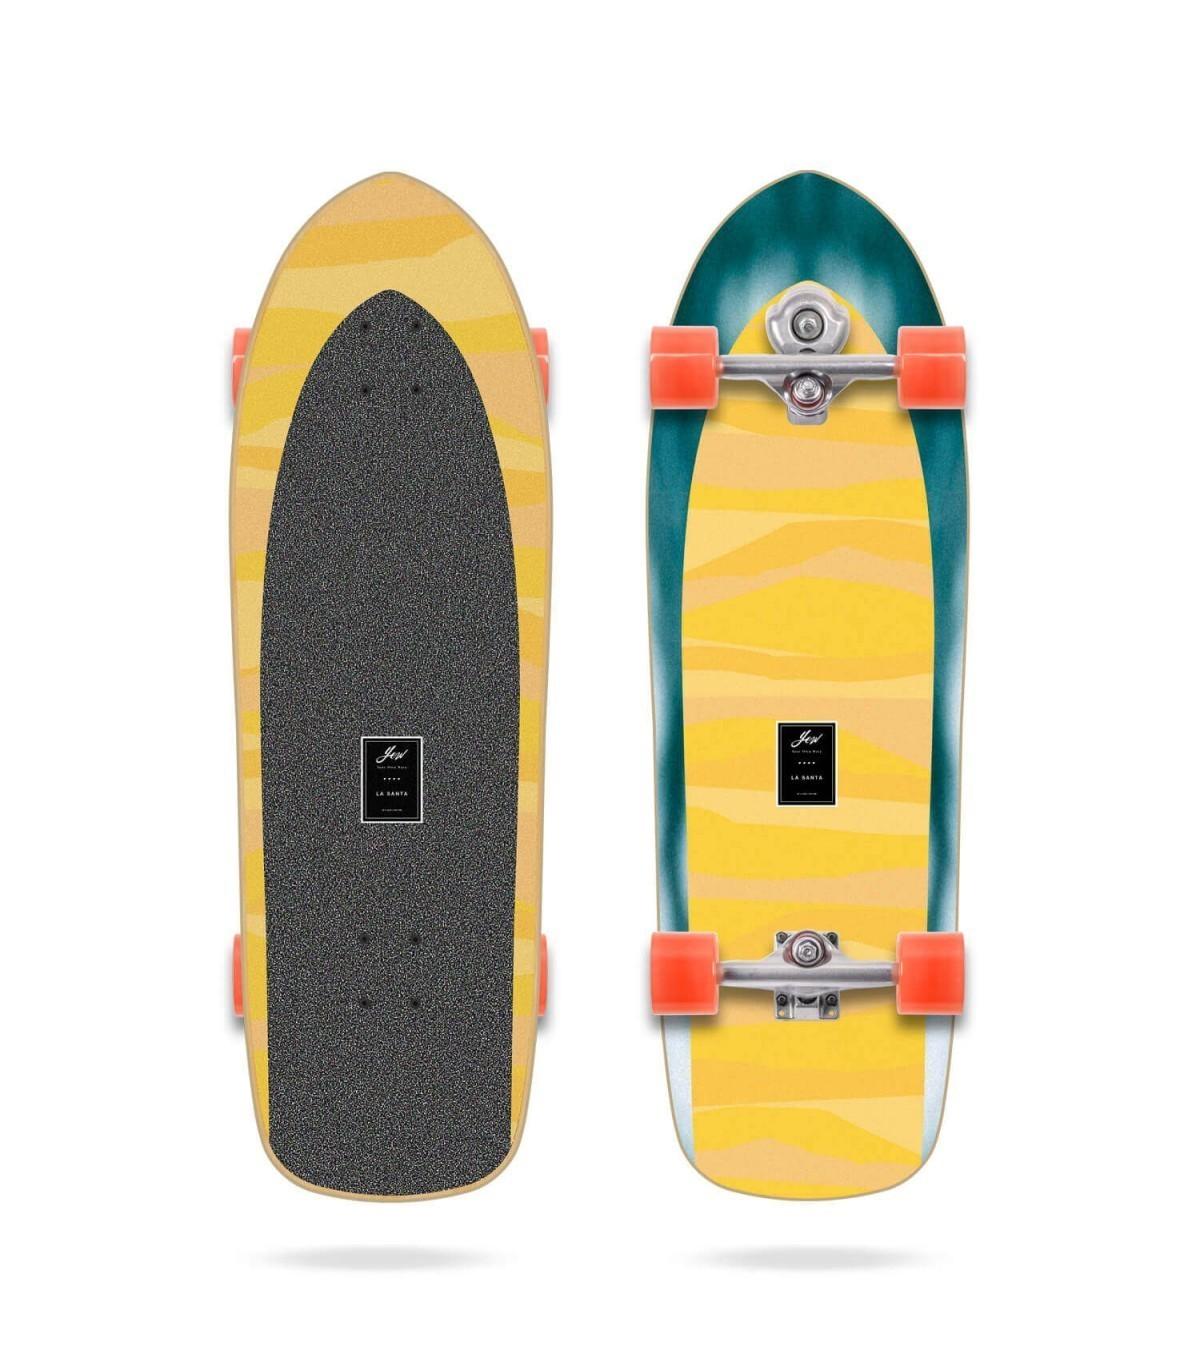 YOW La Santa Surfskate